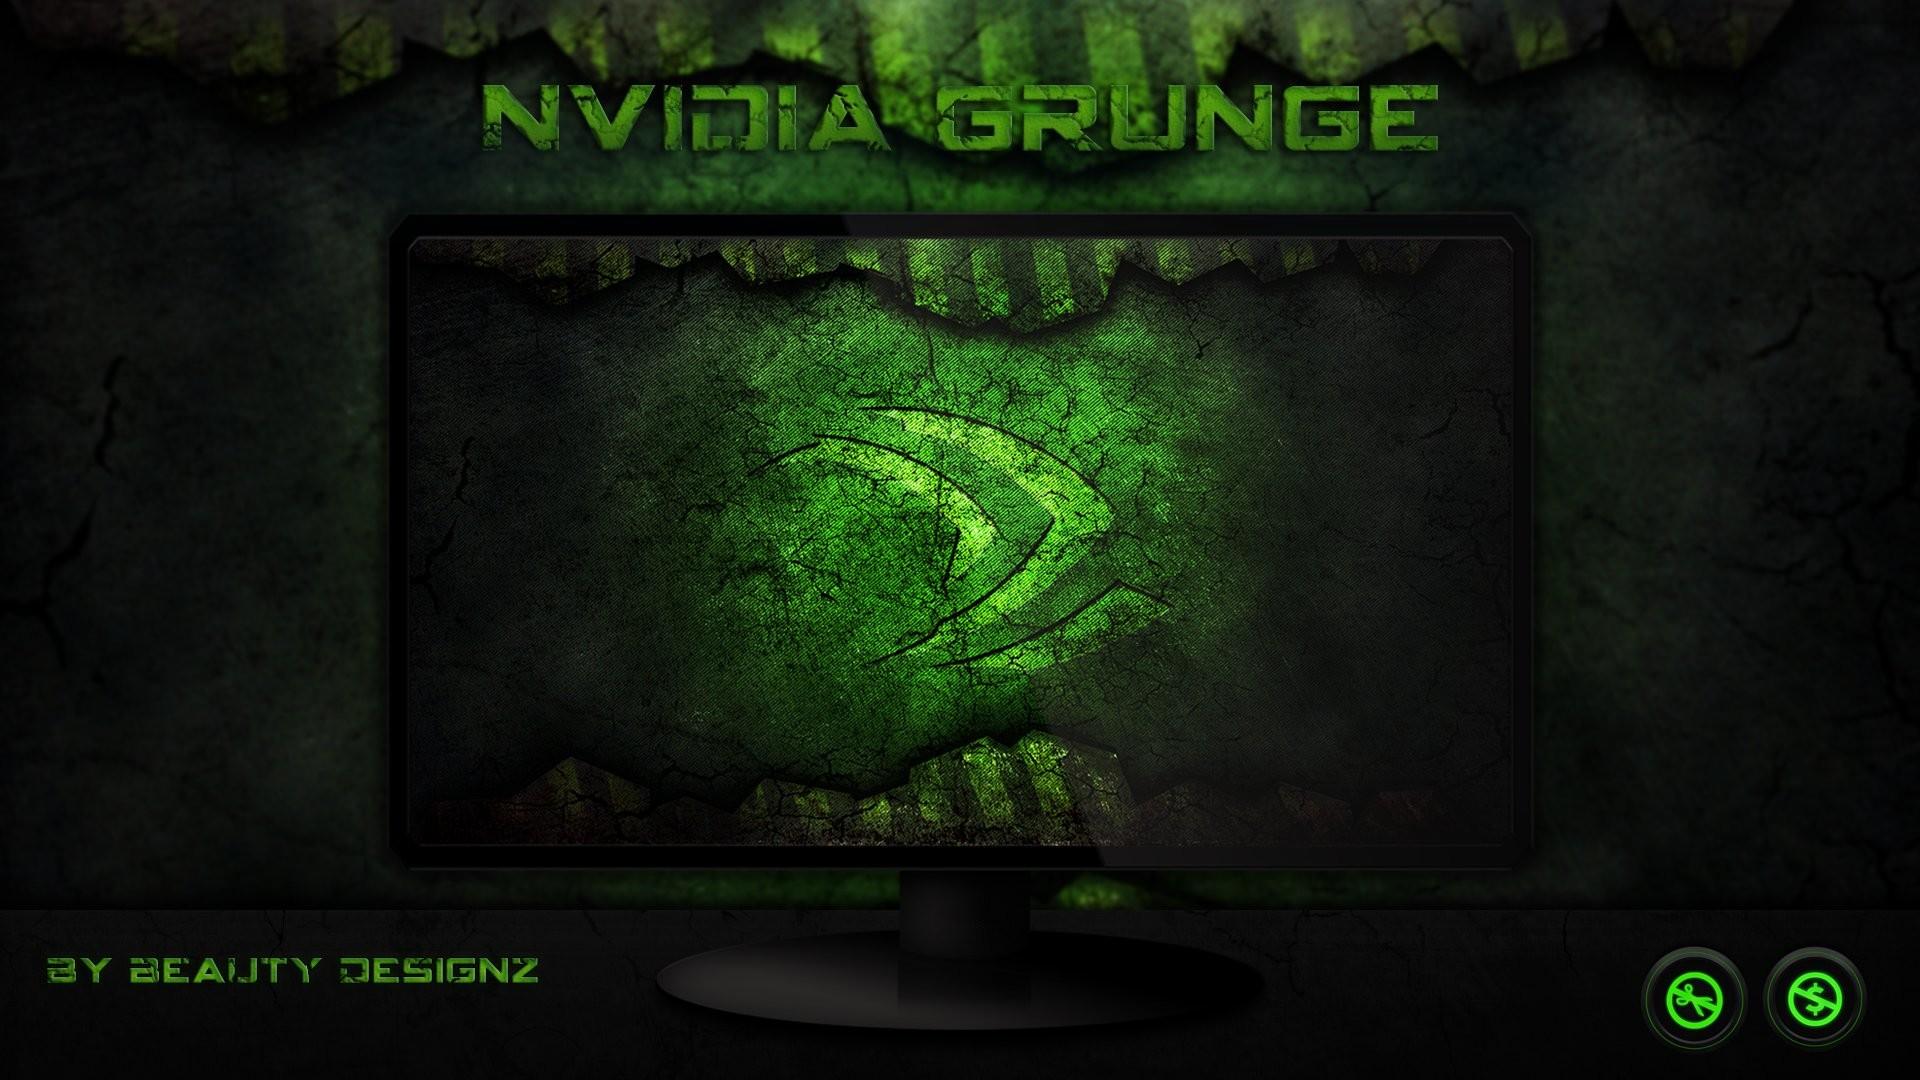 NVIDIA GEFORCE GTX gaming computer wallpaper | | 401195 |  WallpaperUP